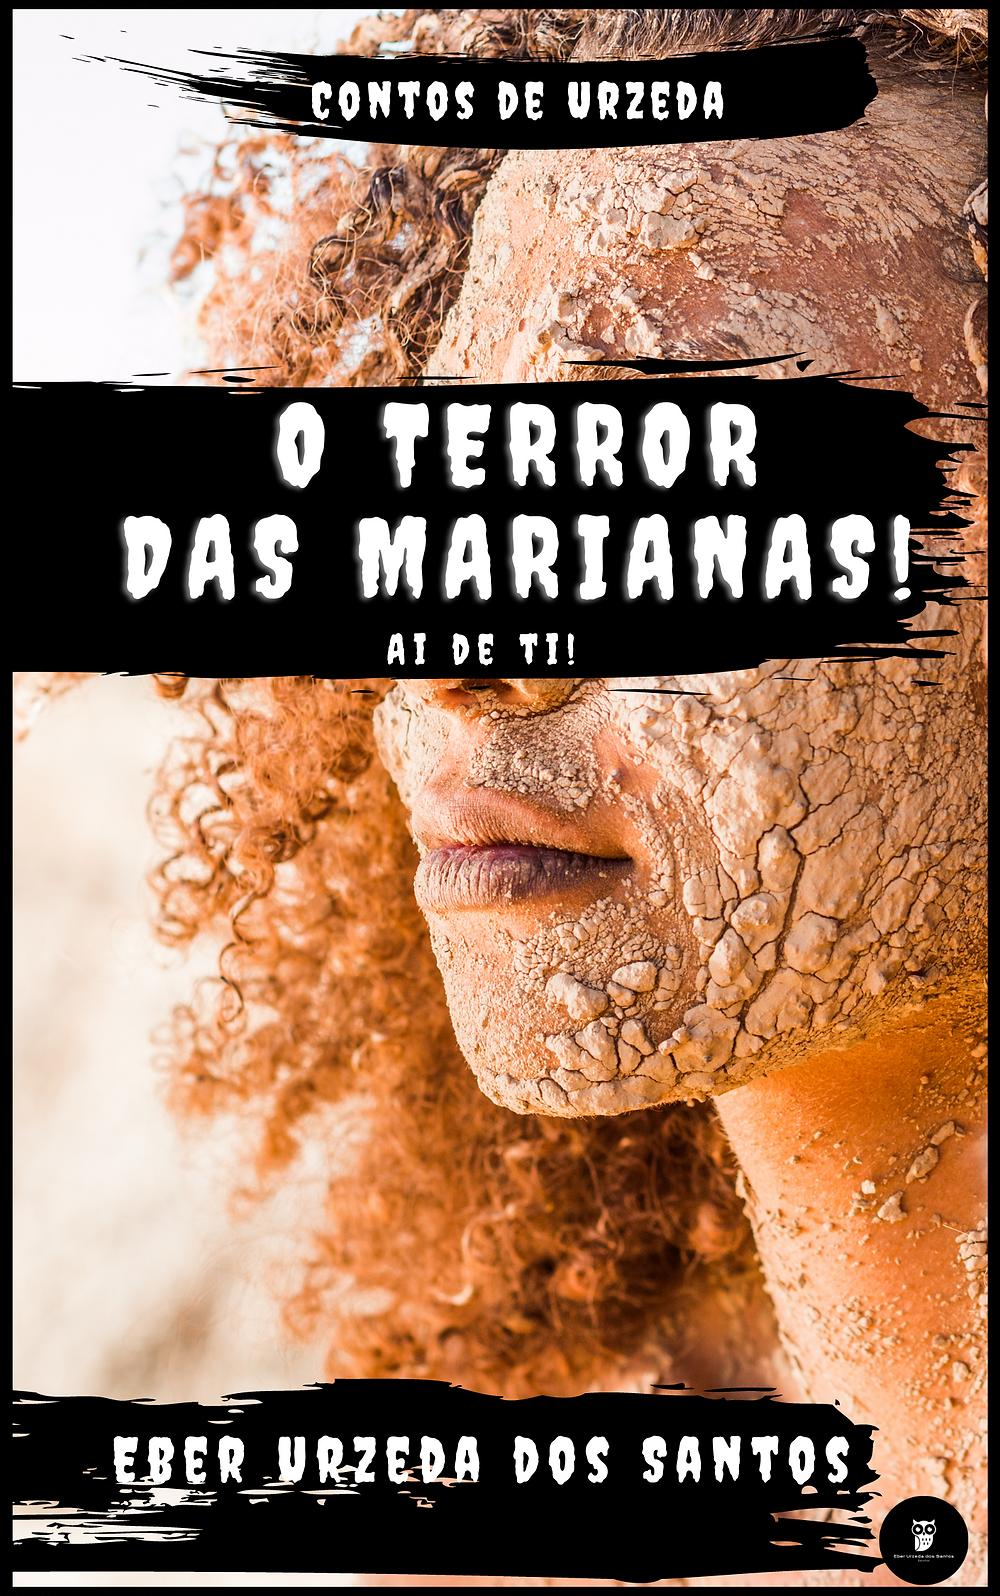 O Terror das Marianas: Contos de Urzeda